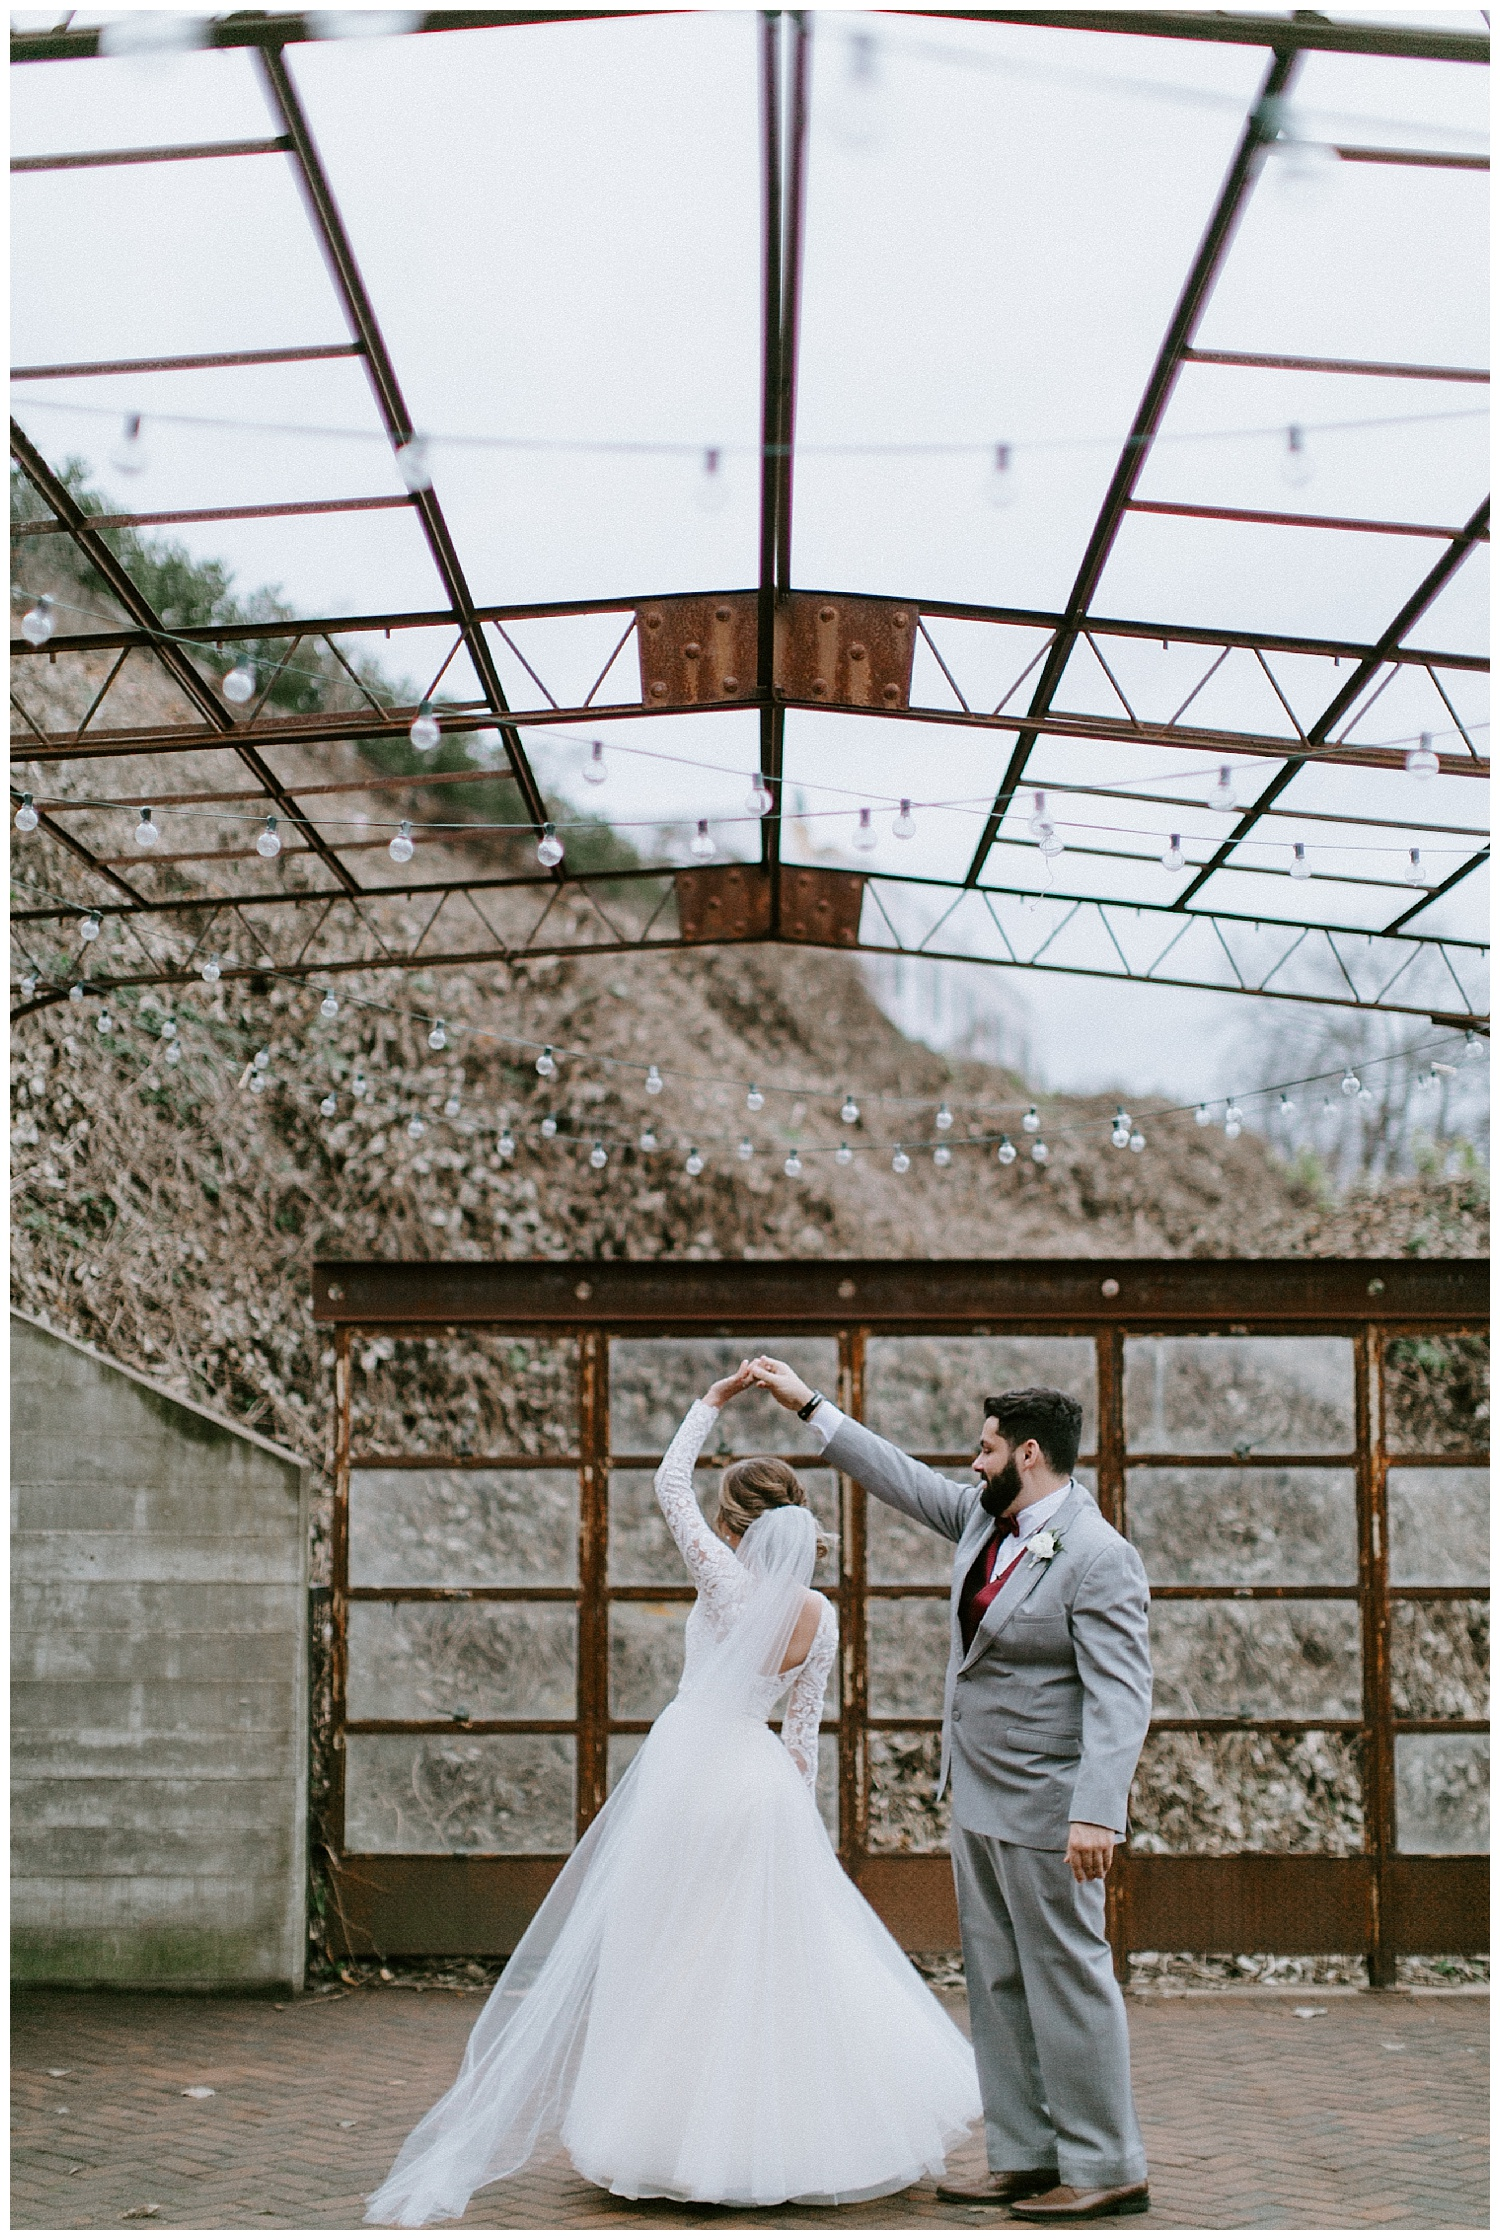 winter-wedding-the standard-knoxville_2019-01-23_0026.jpg